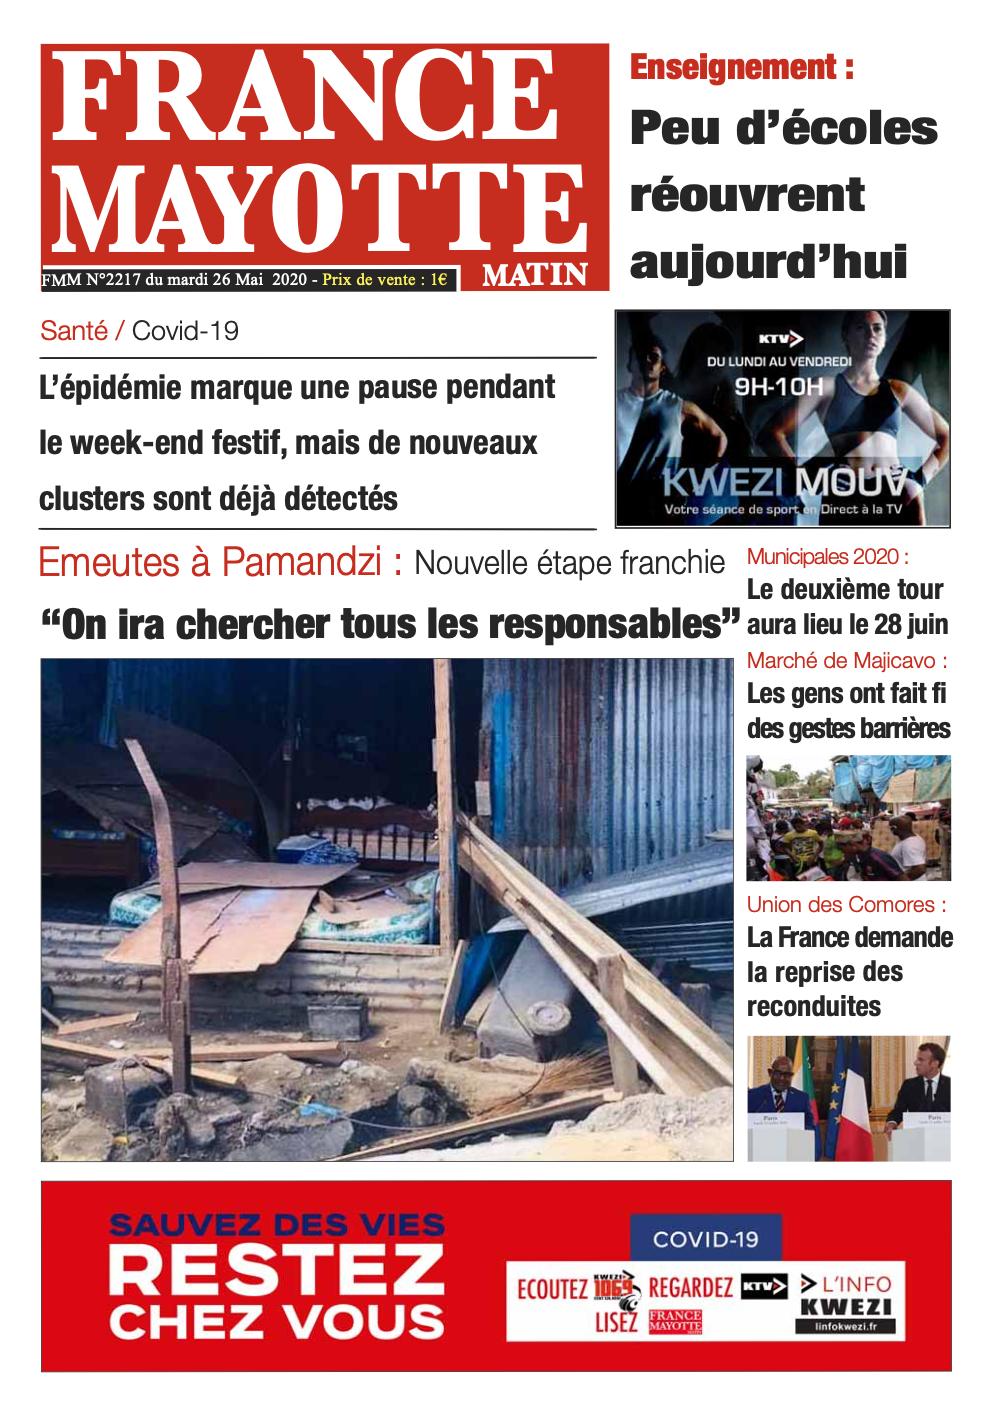 France Mayotte Mardi 26 mai 2020